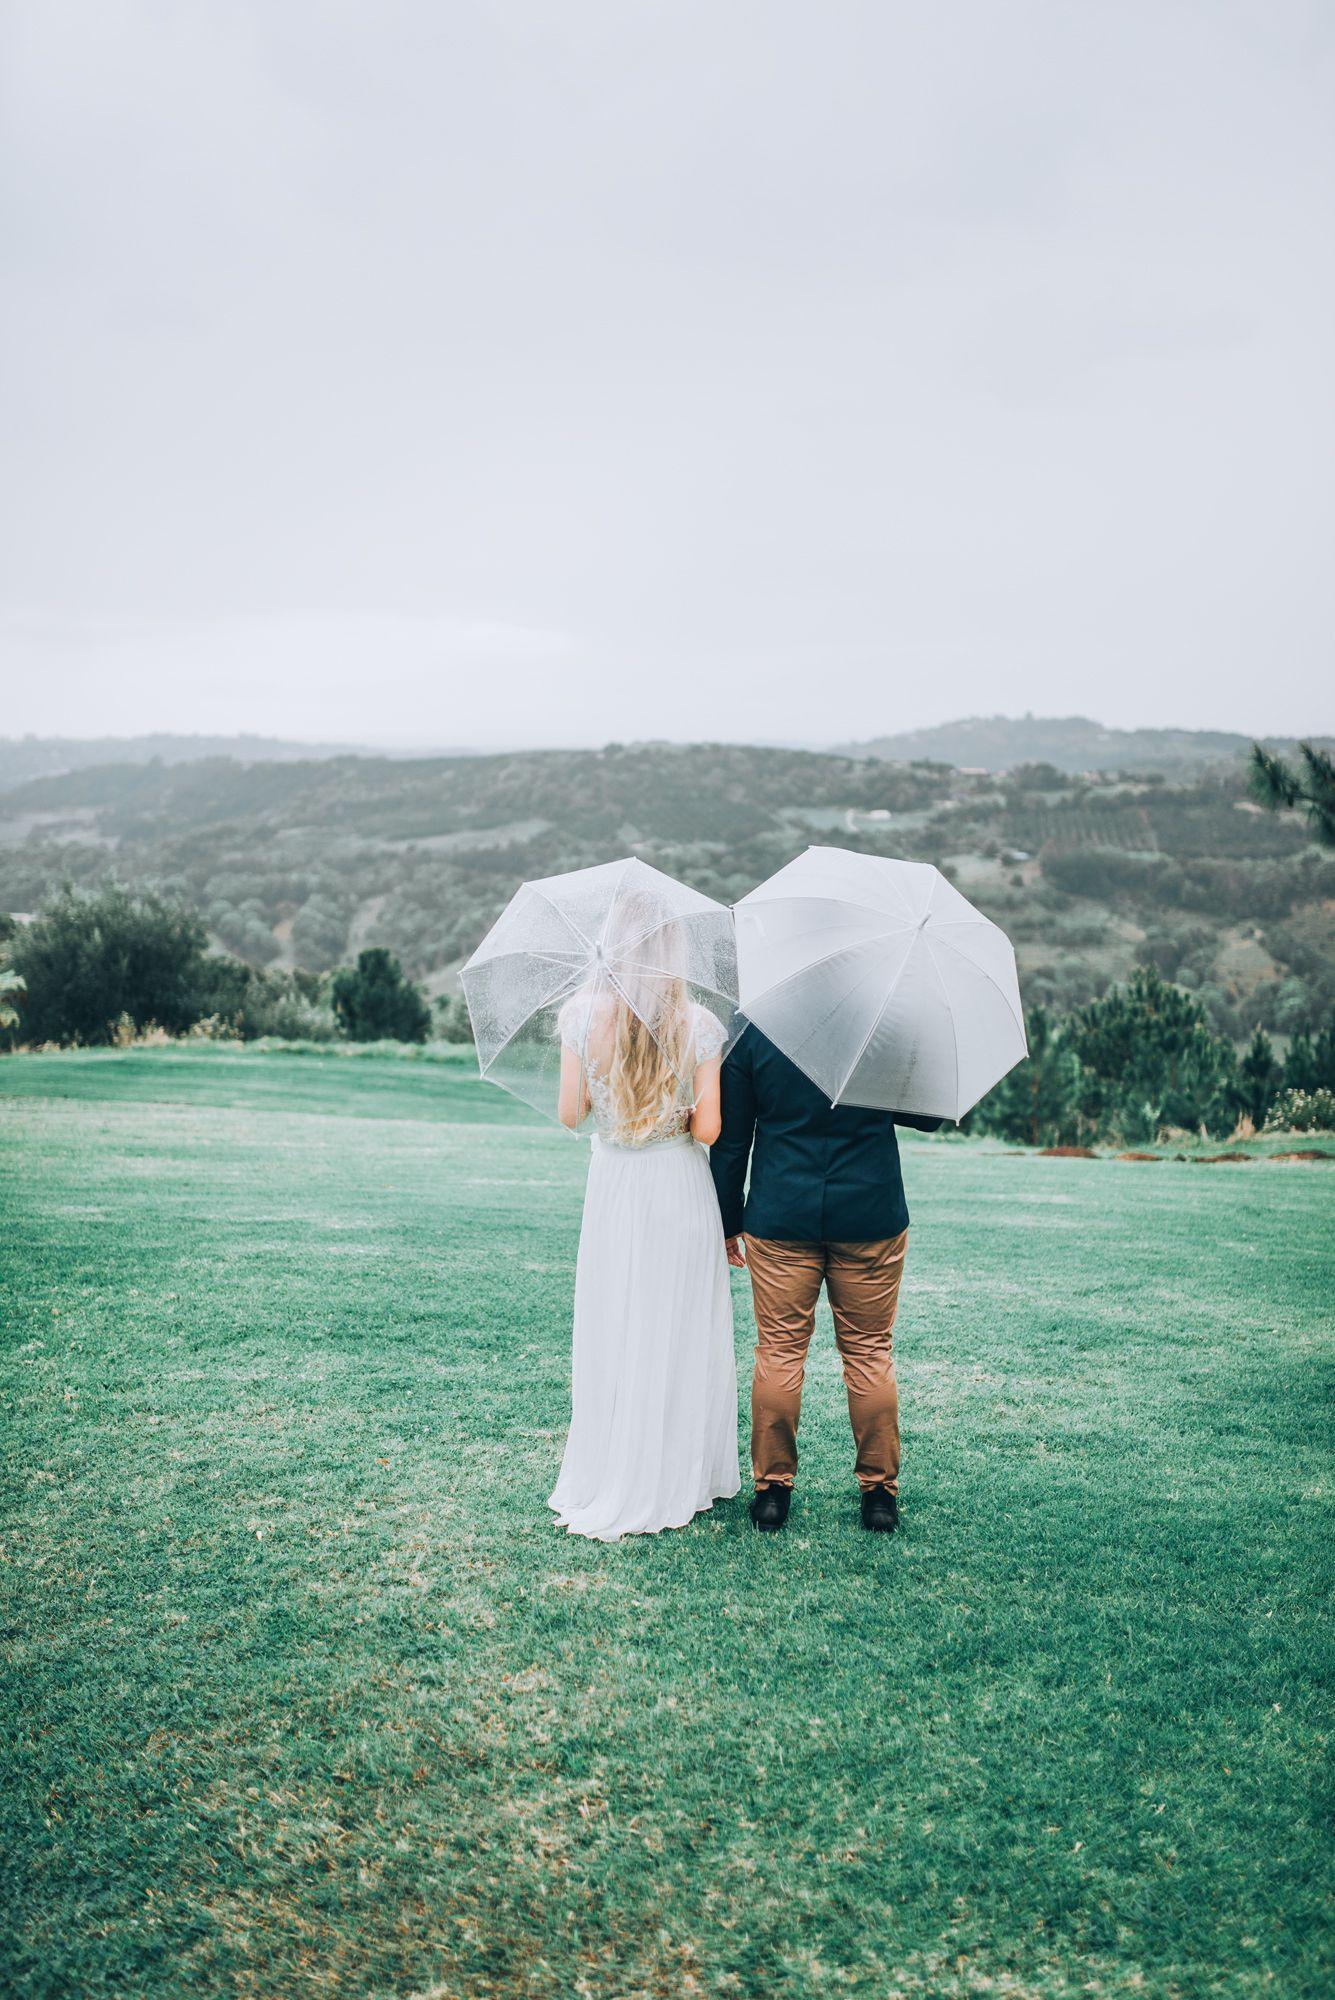 White Translucent Wedding Umbrellas Asp Wedding Decorations